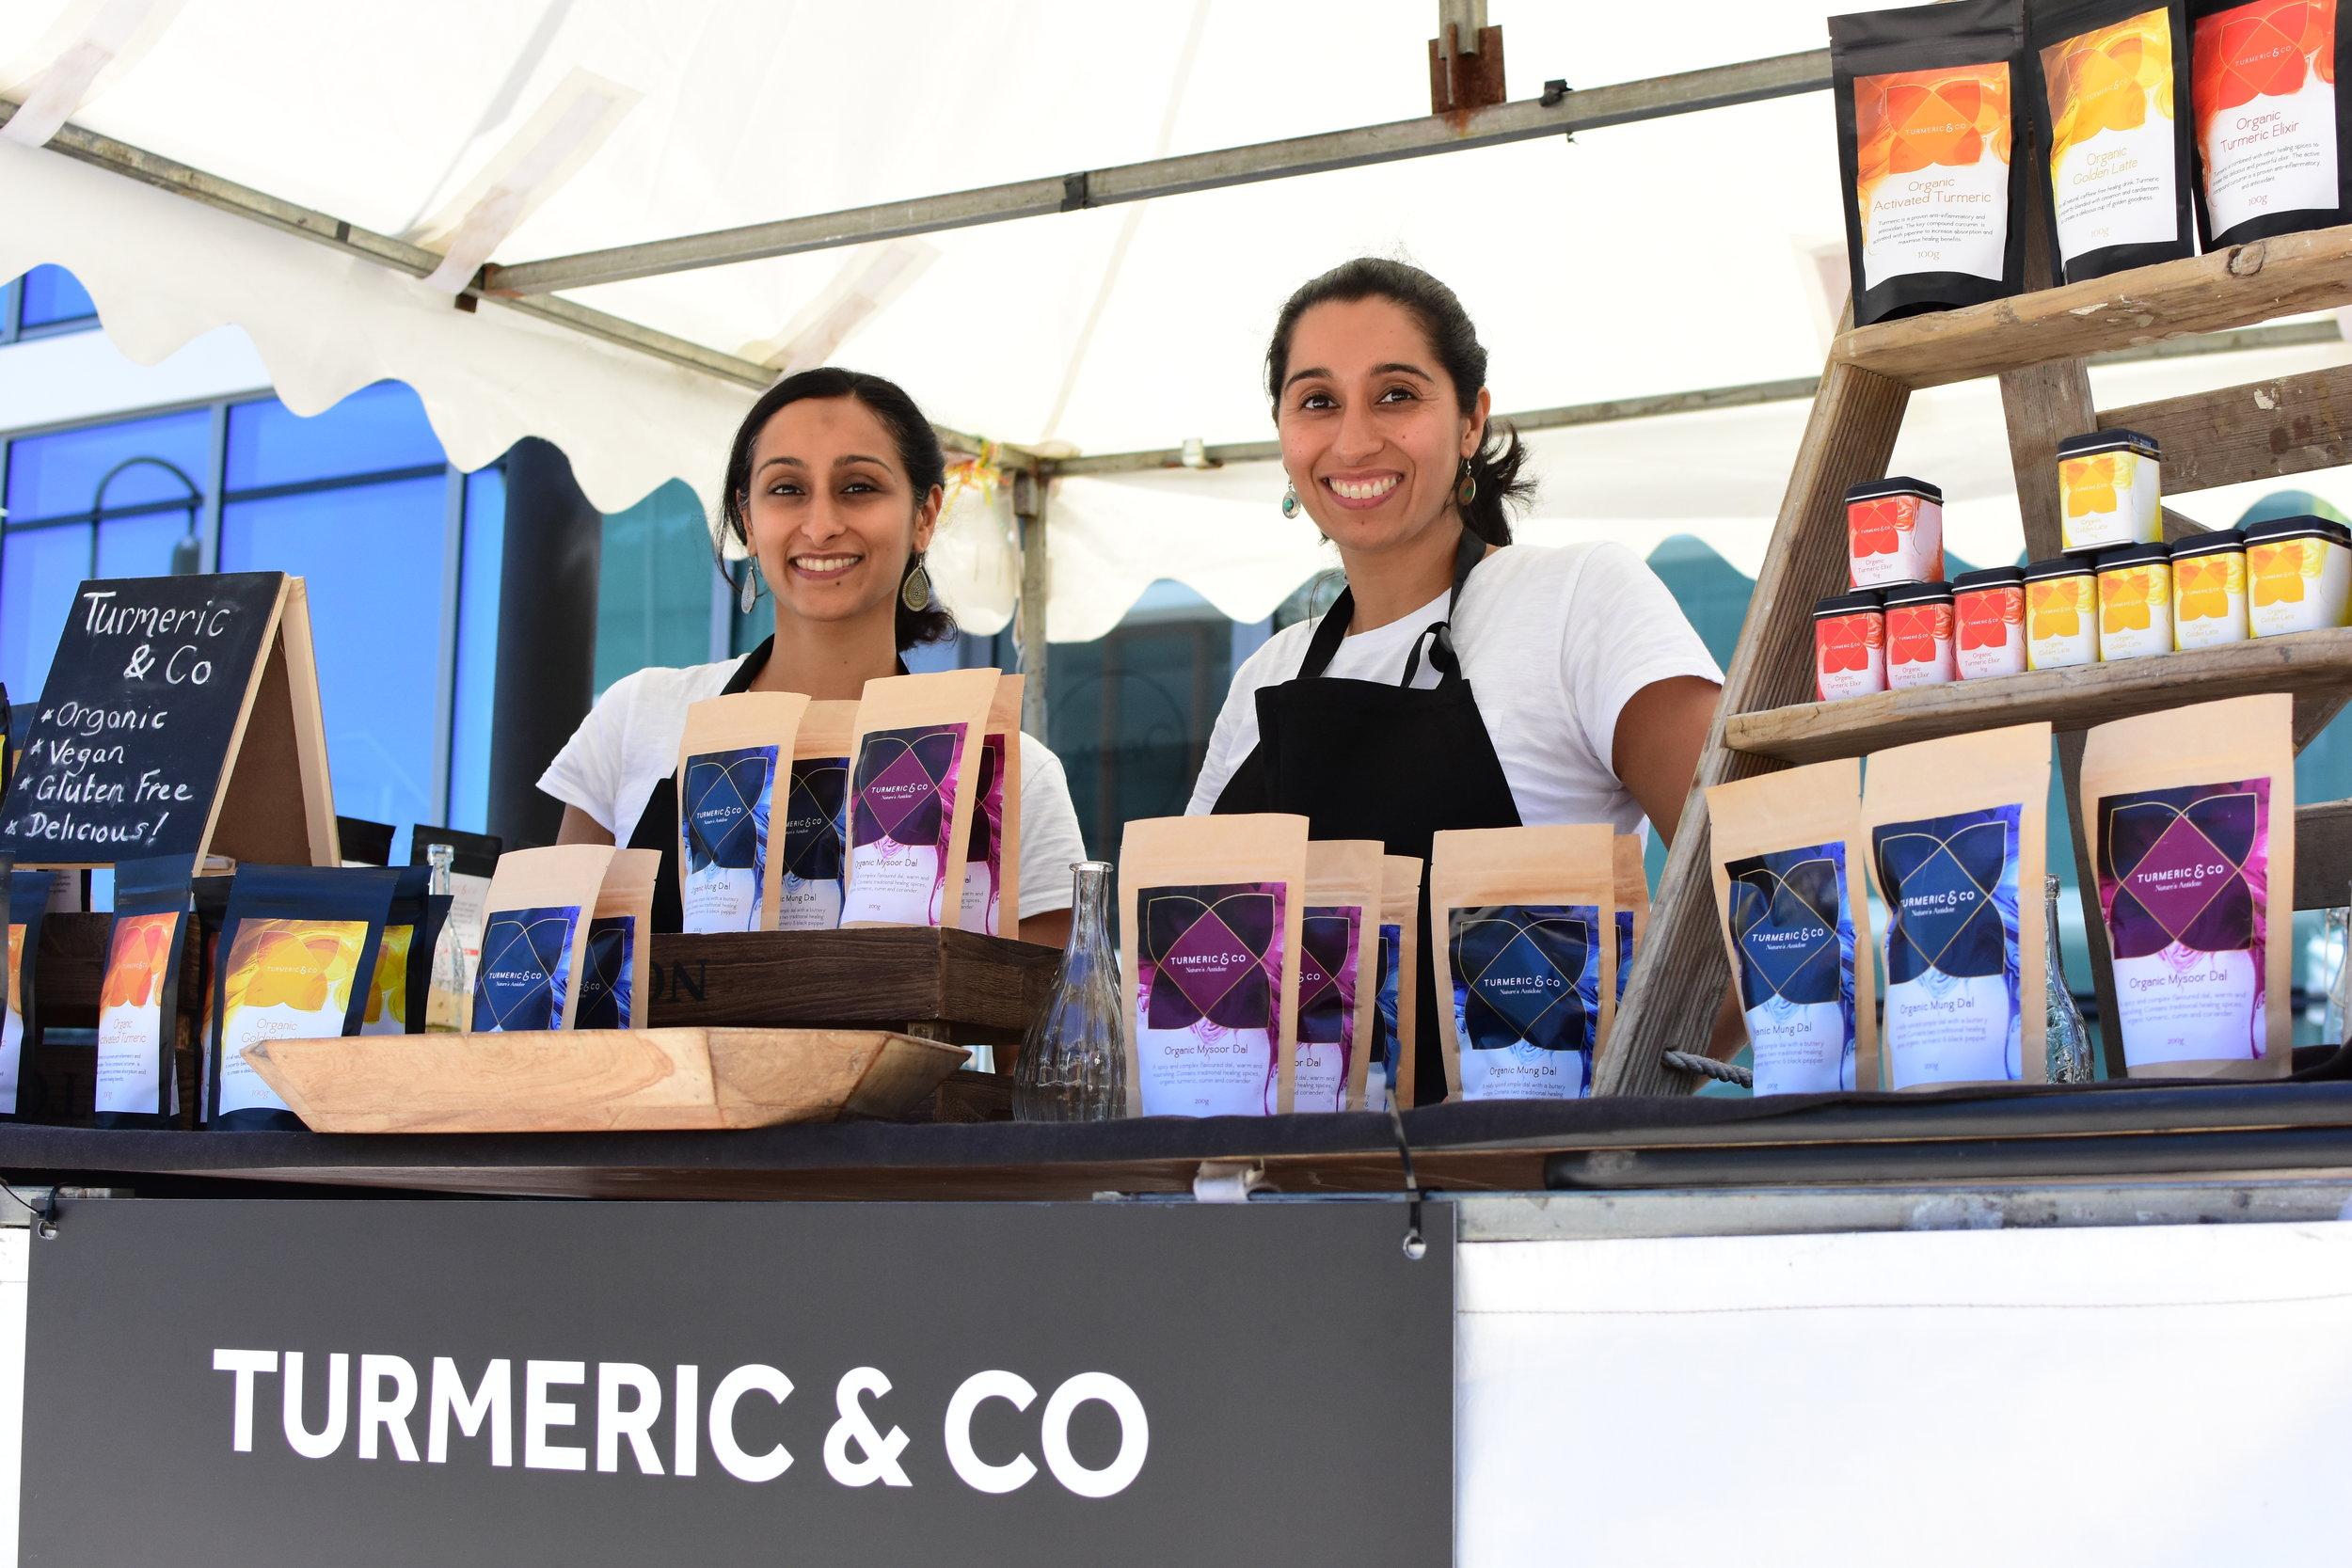 Turmeric & Co - Turmeric Experts